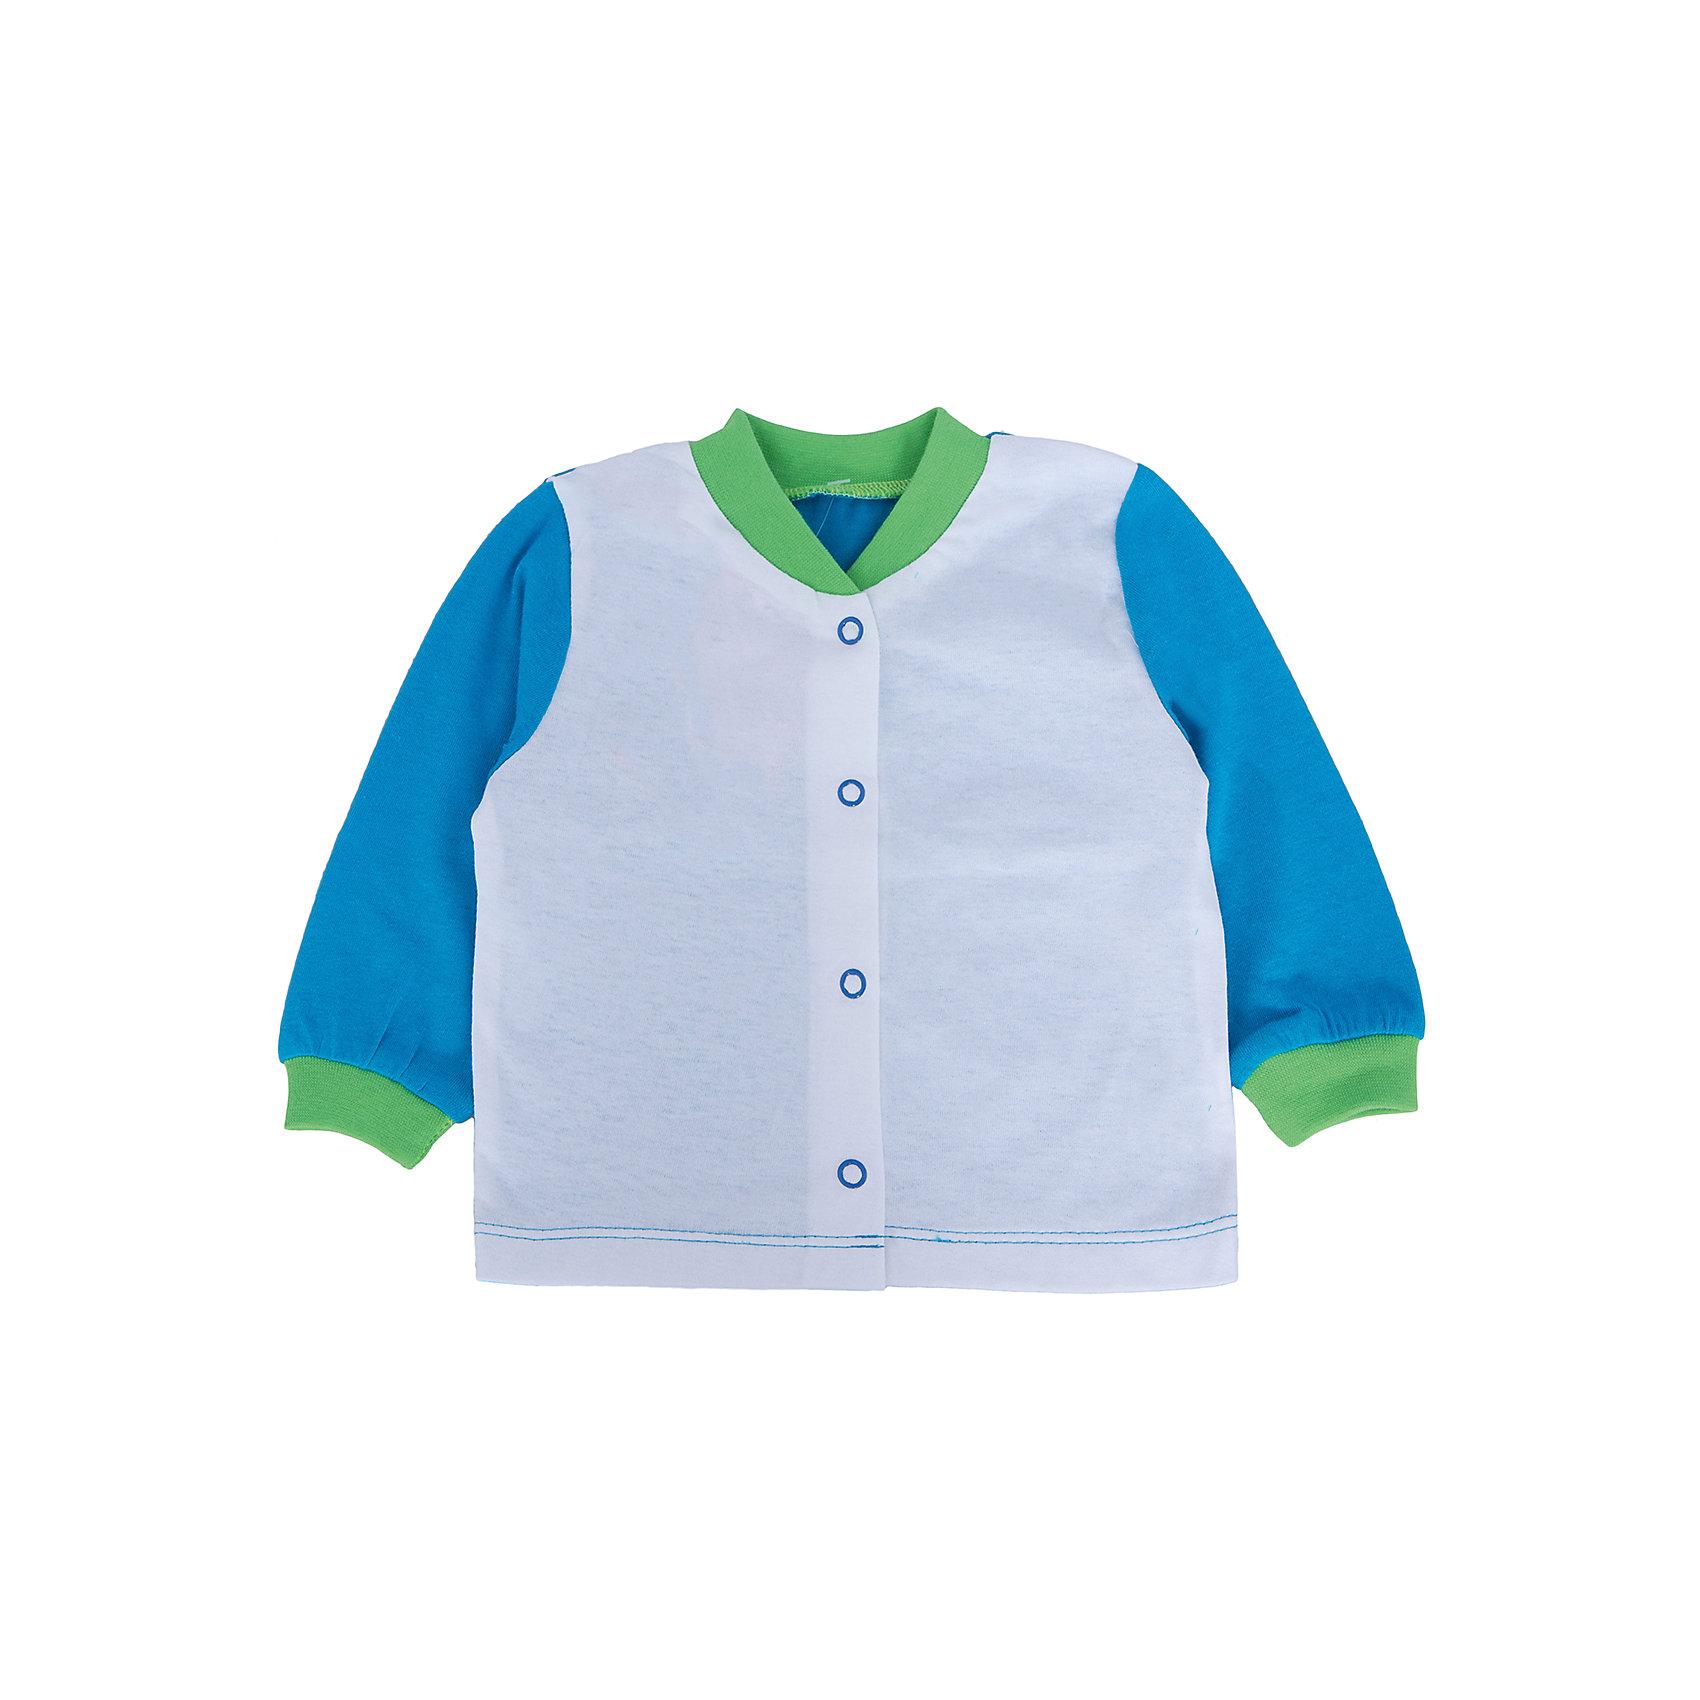 Goldy Рубашка для мальчика Goldy обои виниловые флизелиновые zambaiti parati romantica r6650